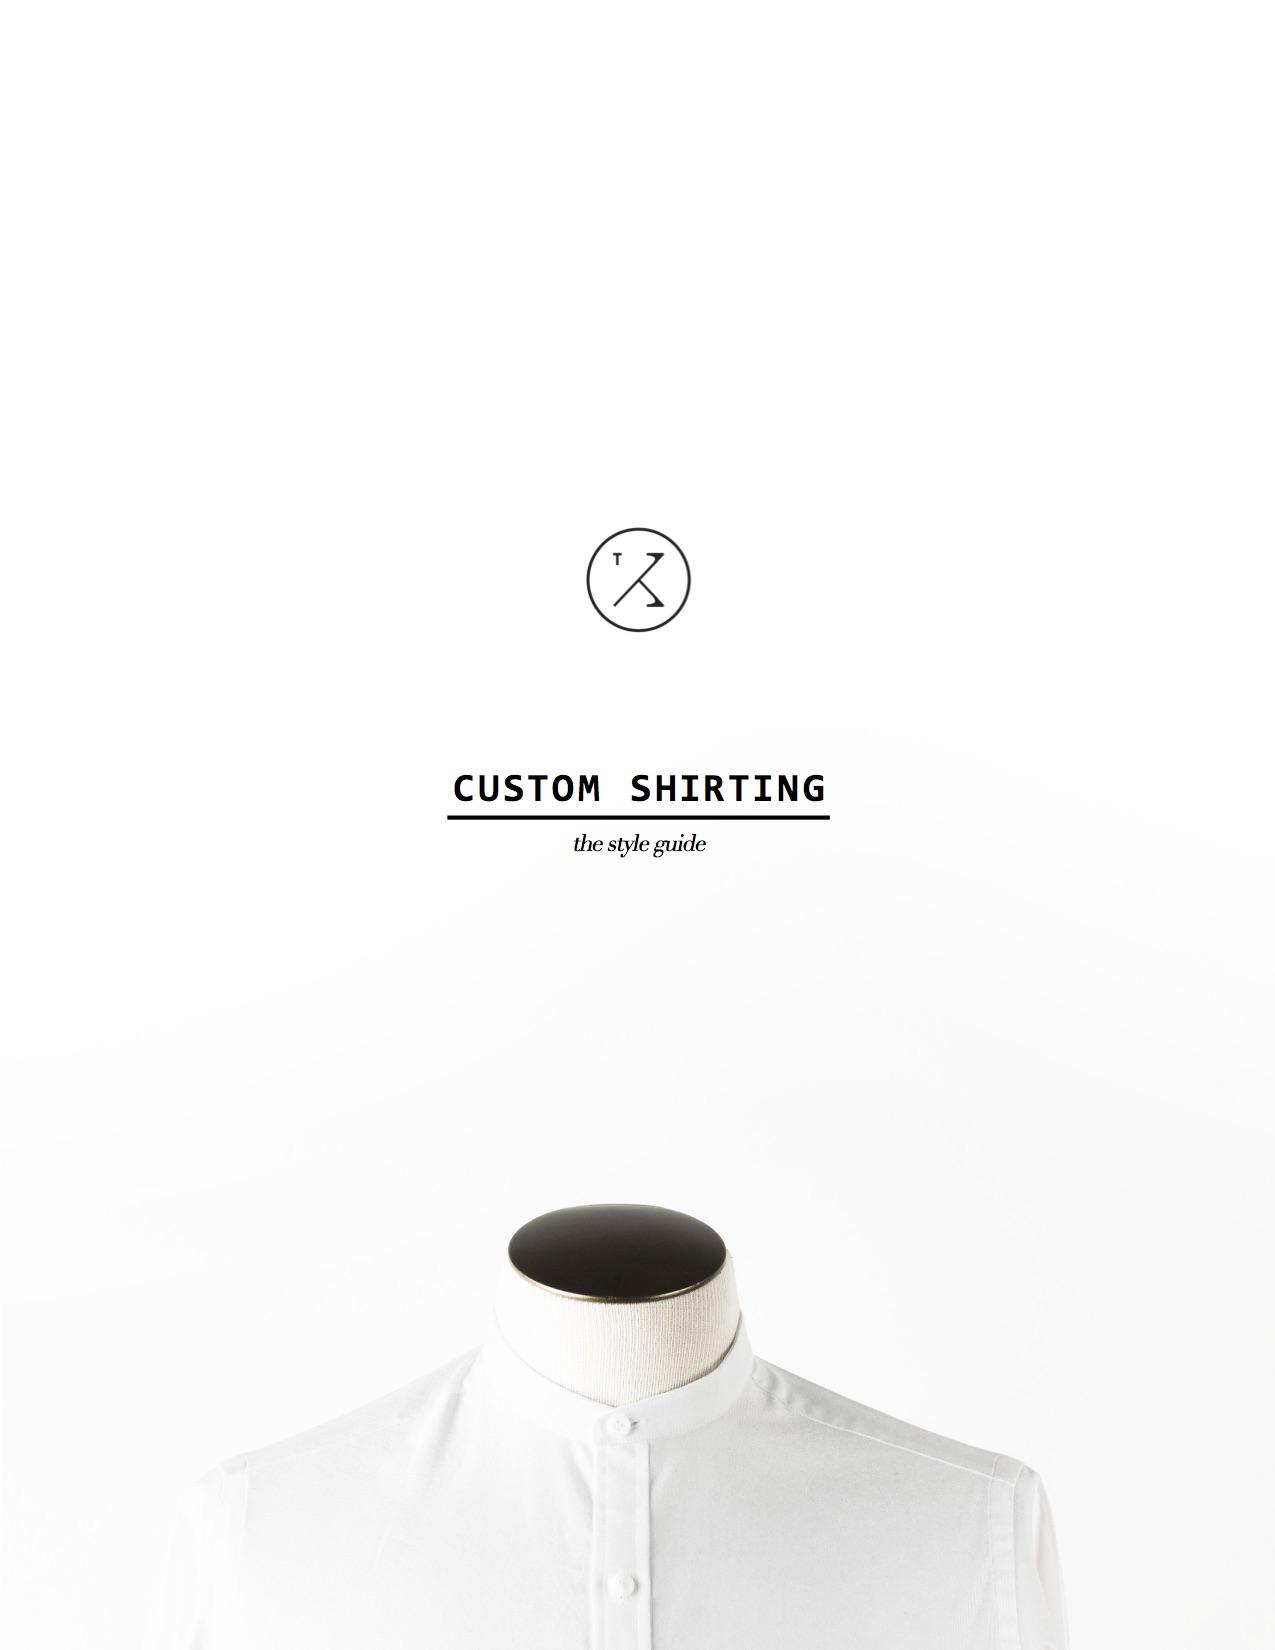 shirtingguide